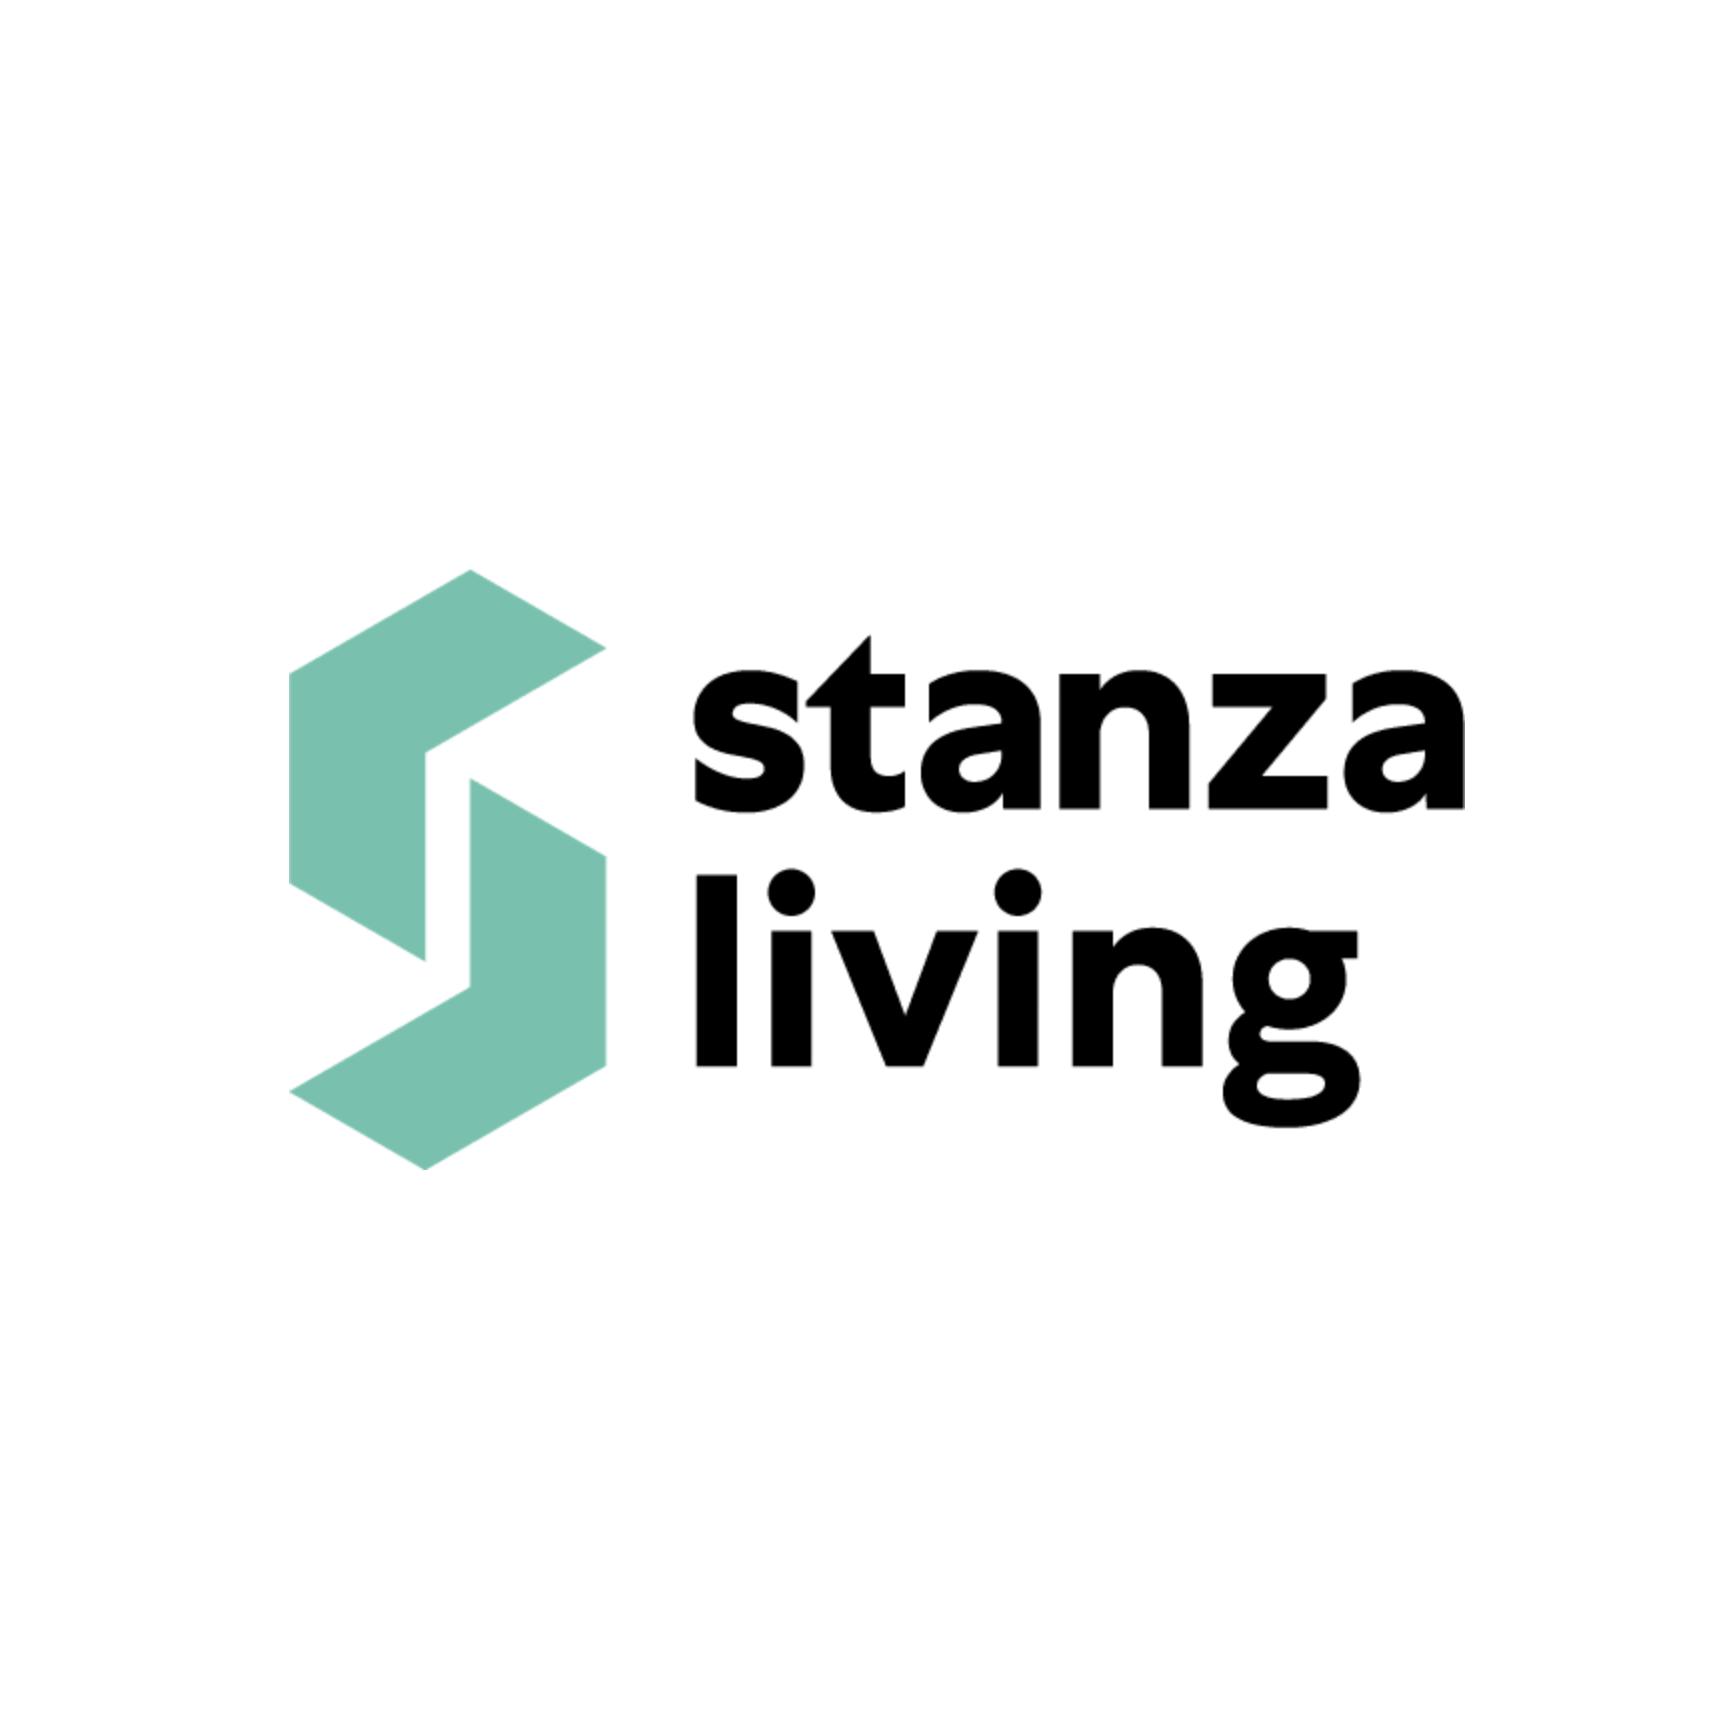 Stanza Living - Coliving Company